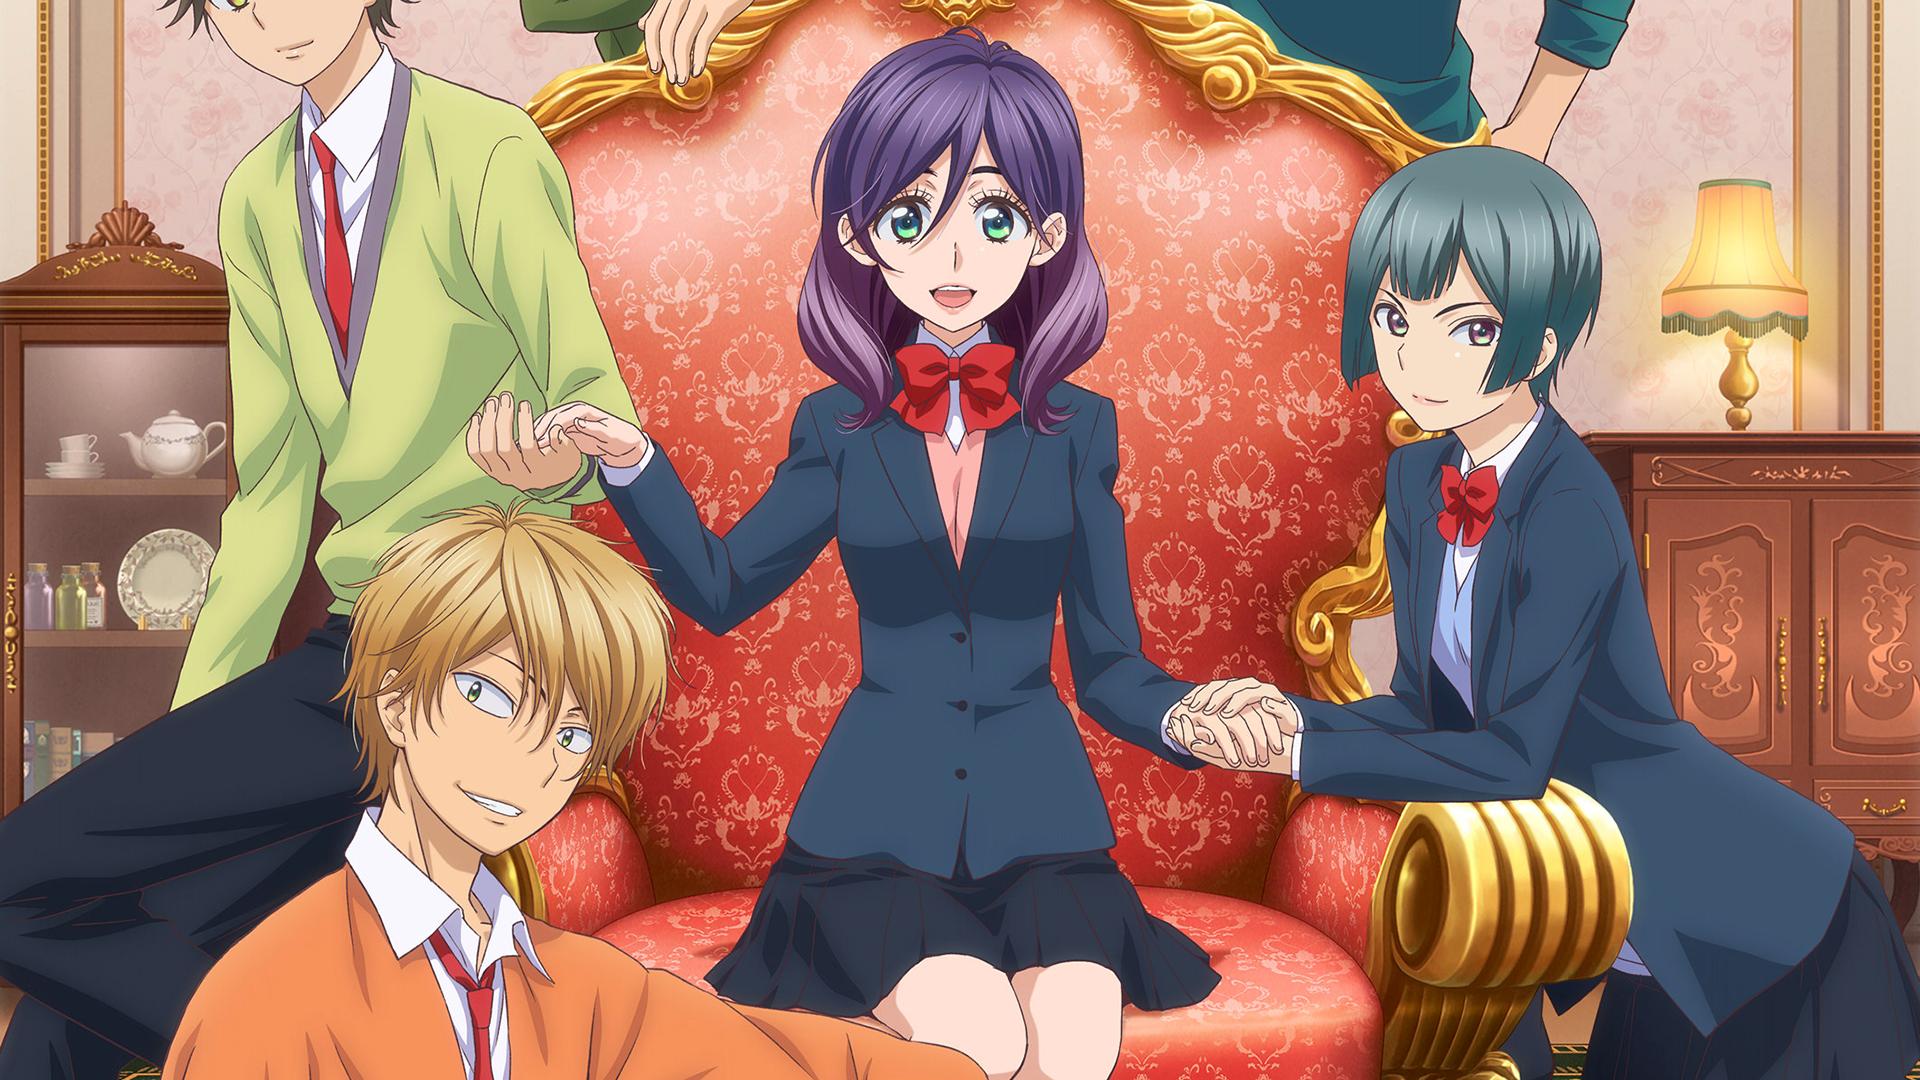 Download anime pack watashi ga motete dousunda episode 1 12 complete english subbed